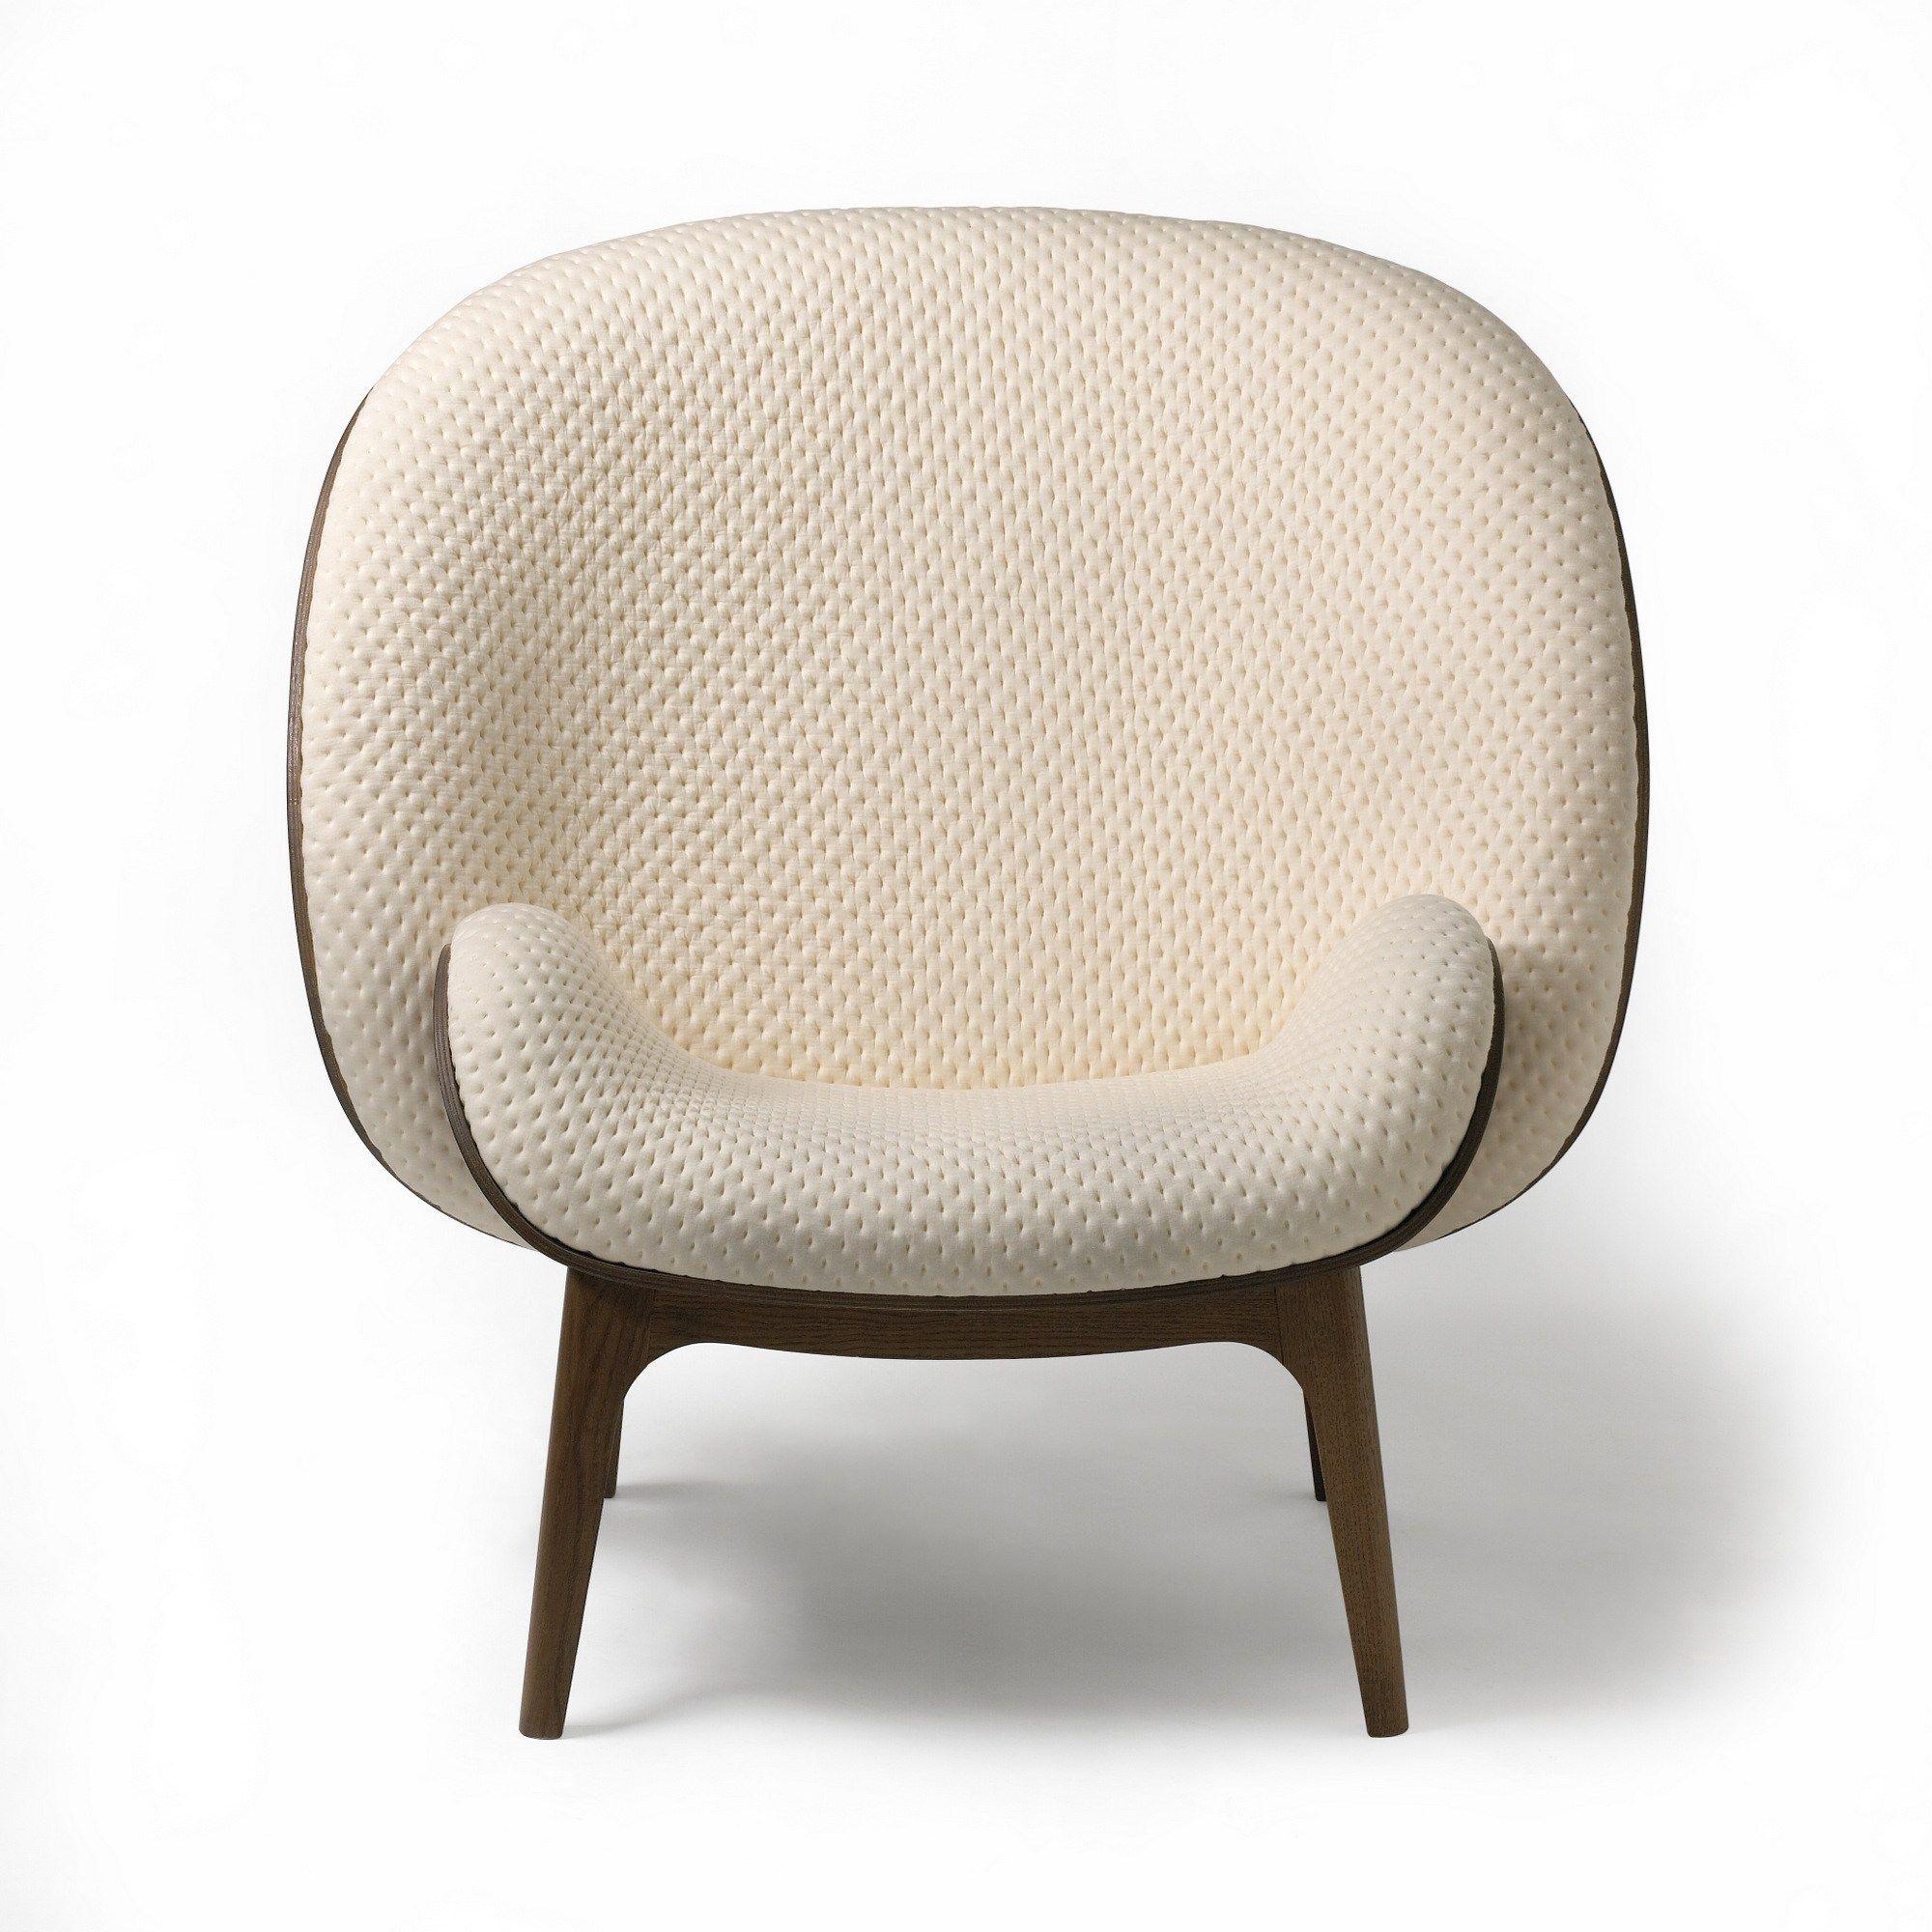 Studio Jean Marc Gady bergere fabric armchair hugperrouin sieges design jean